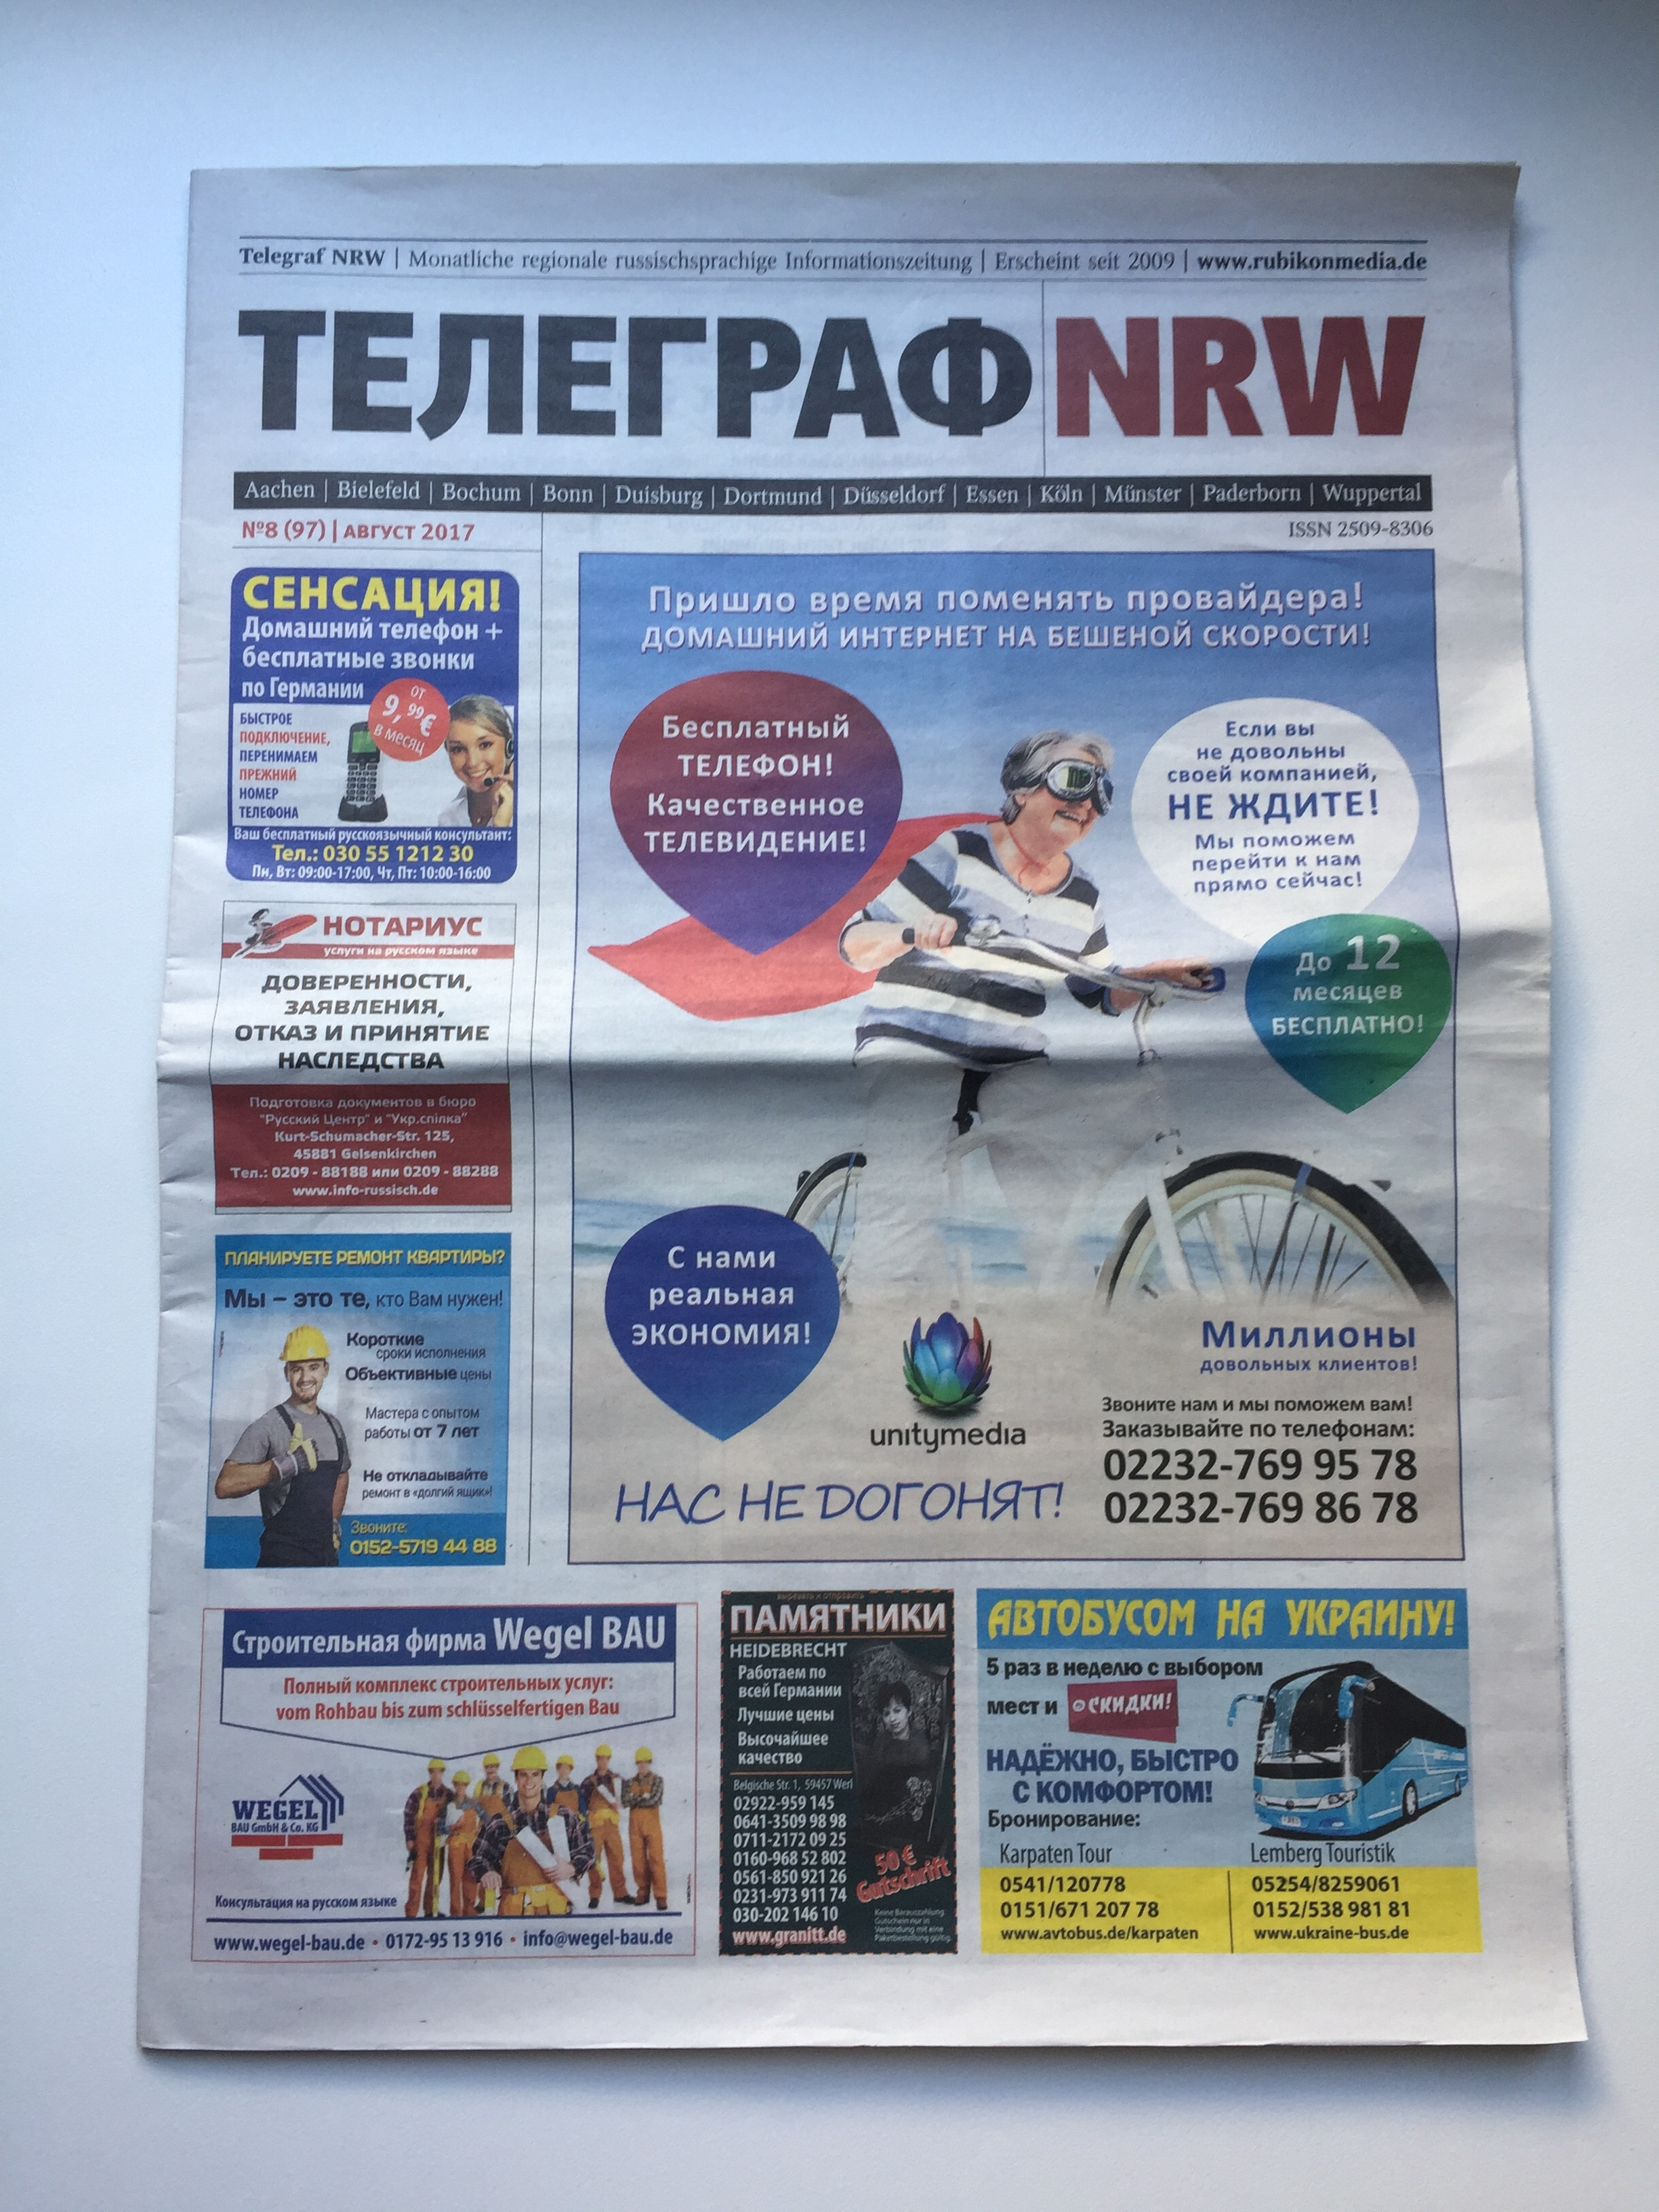 kscheib telegraf NRW Titelseite